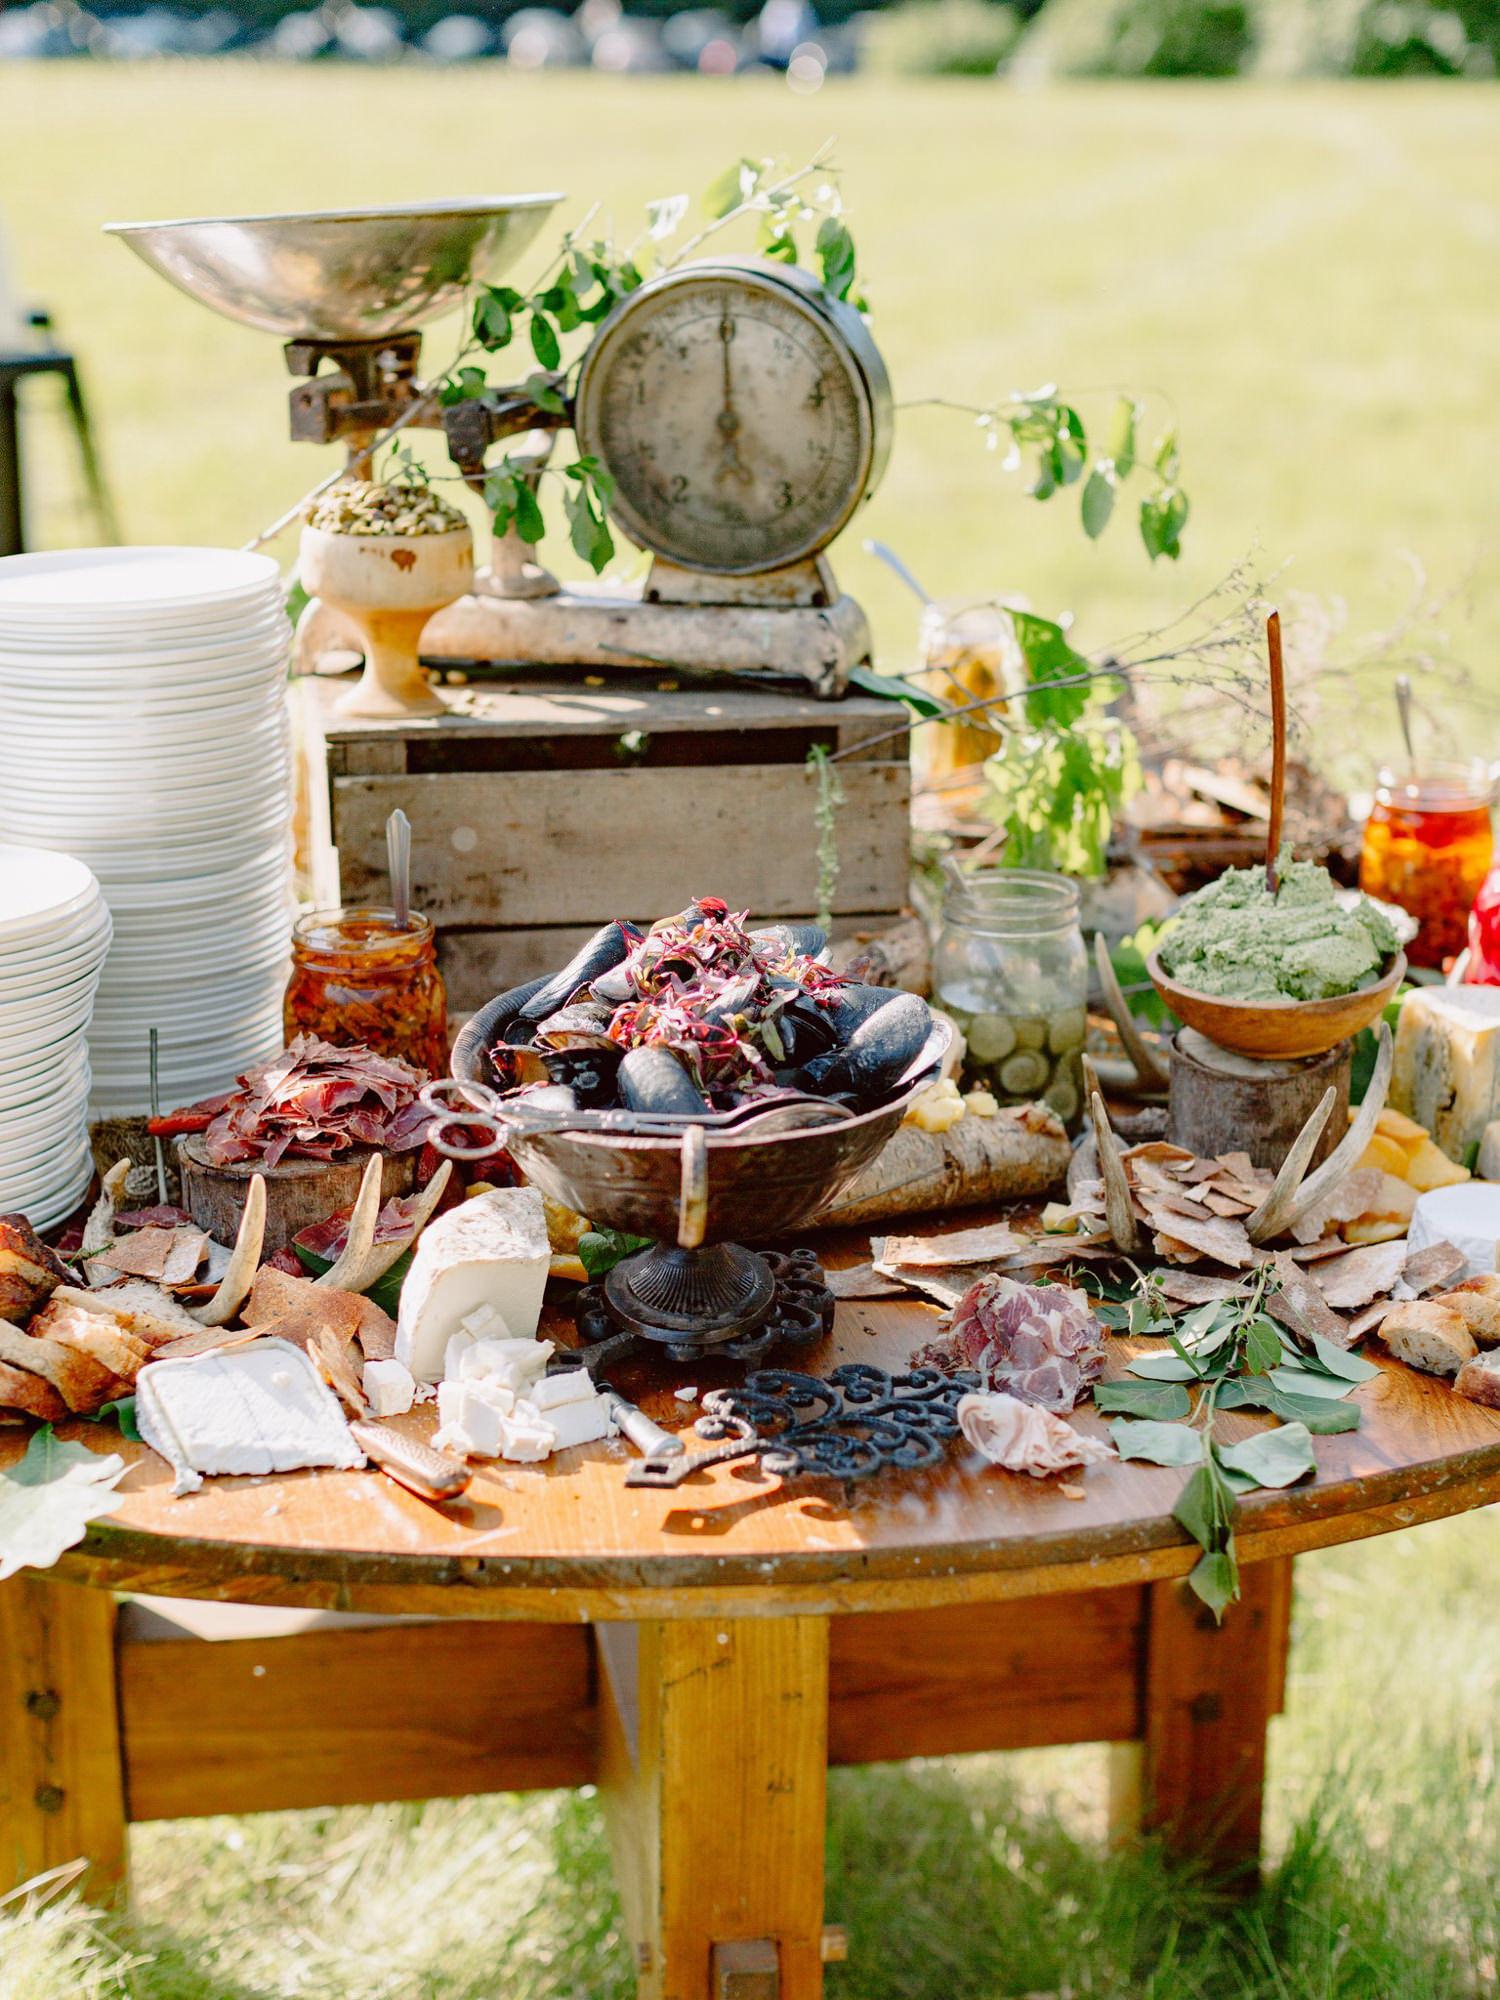 vintage-wedding-reception-appetizers-proscuitto-mussels-best-wedding-photos-benj-haisch-seattle-photographers